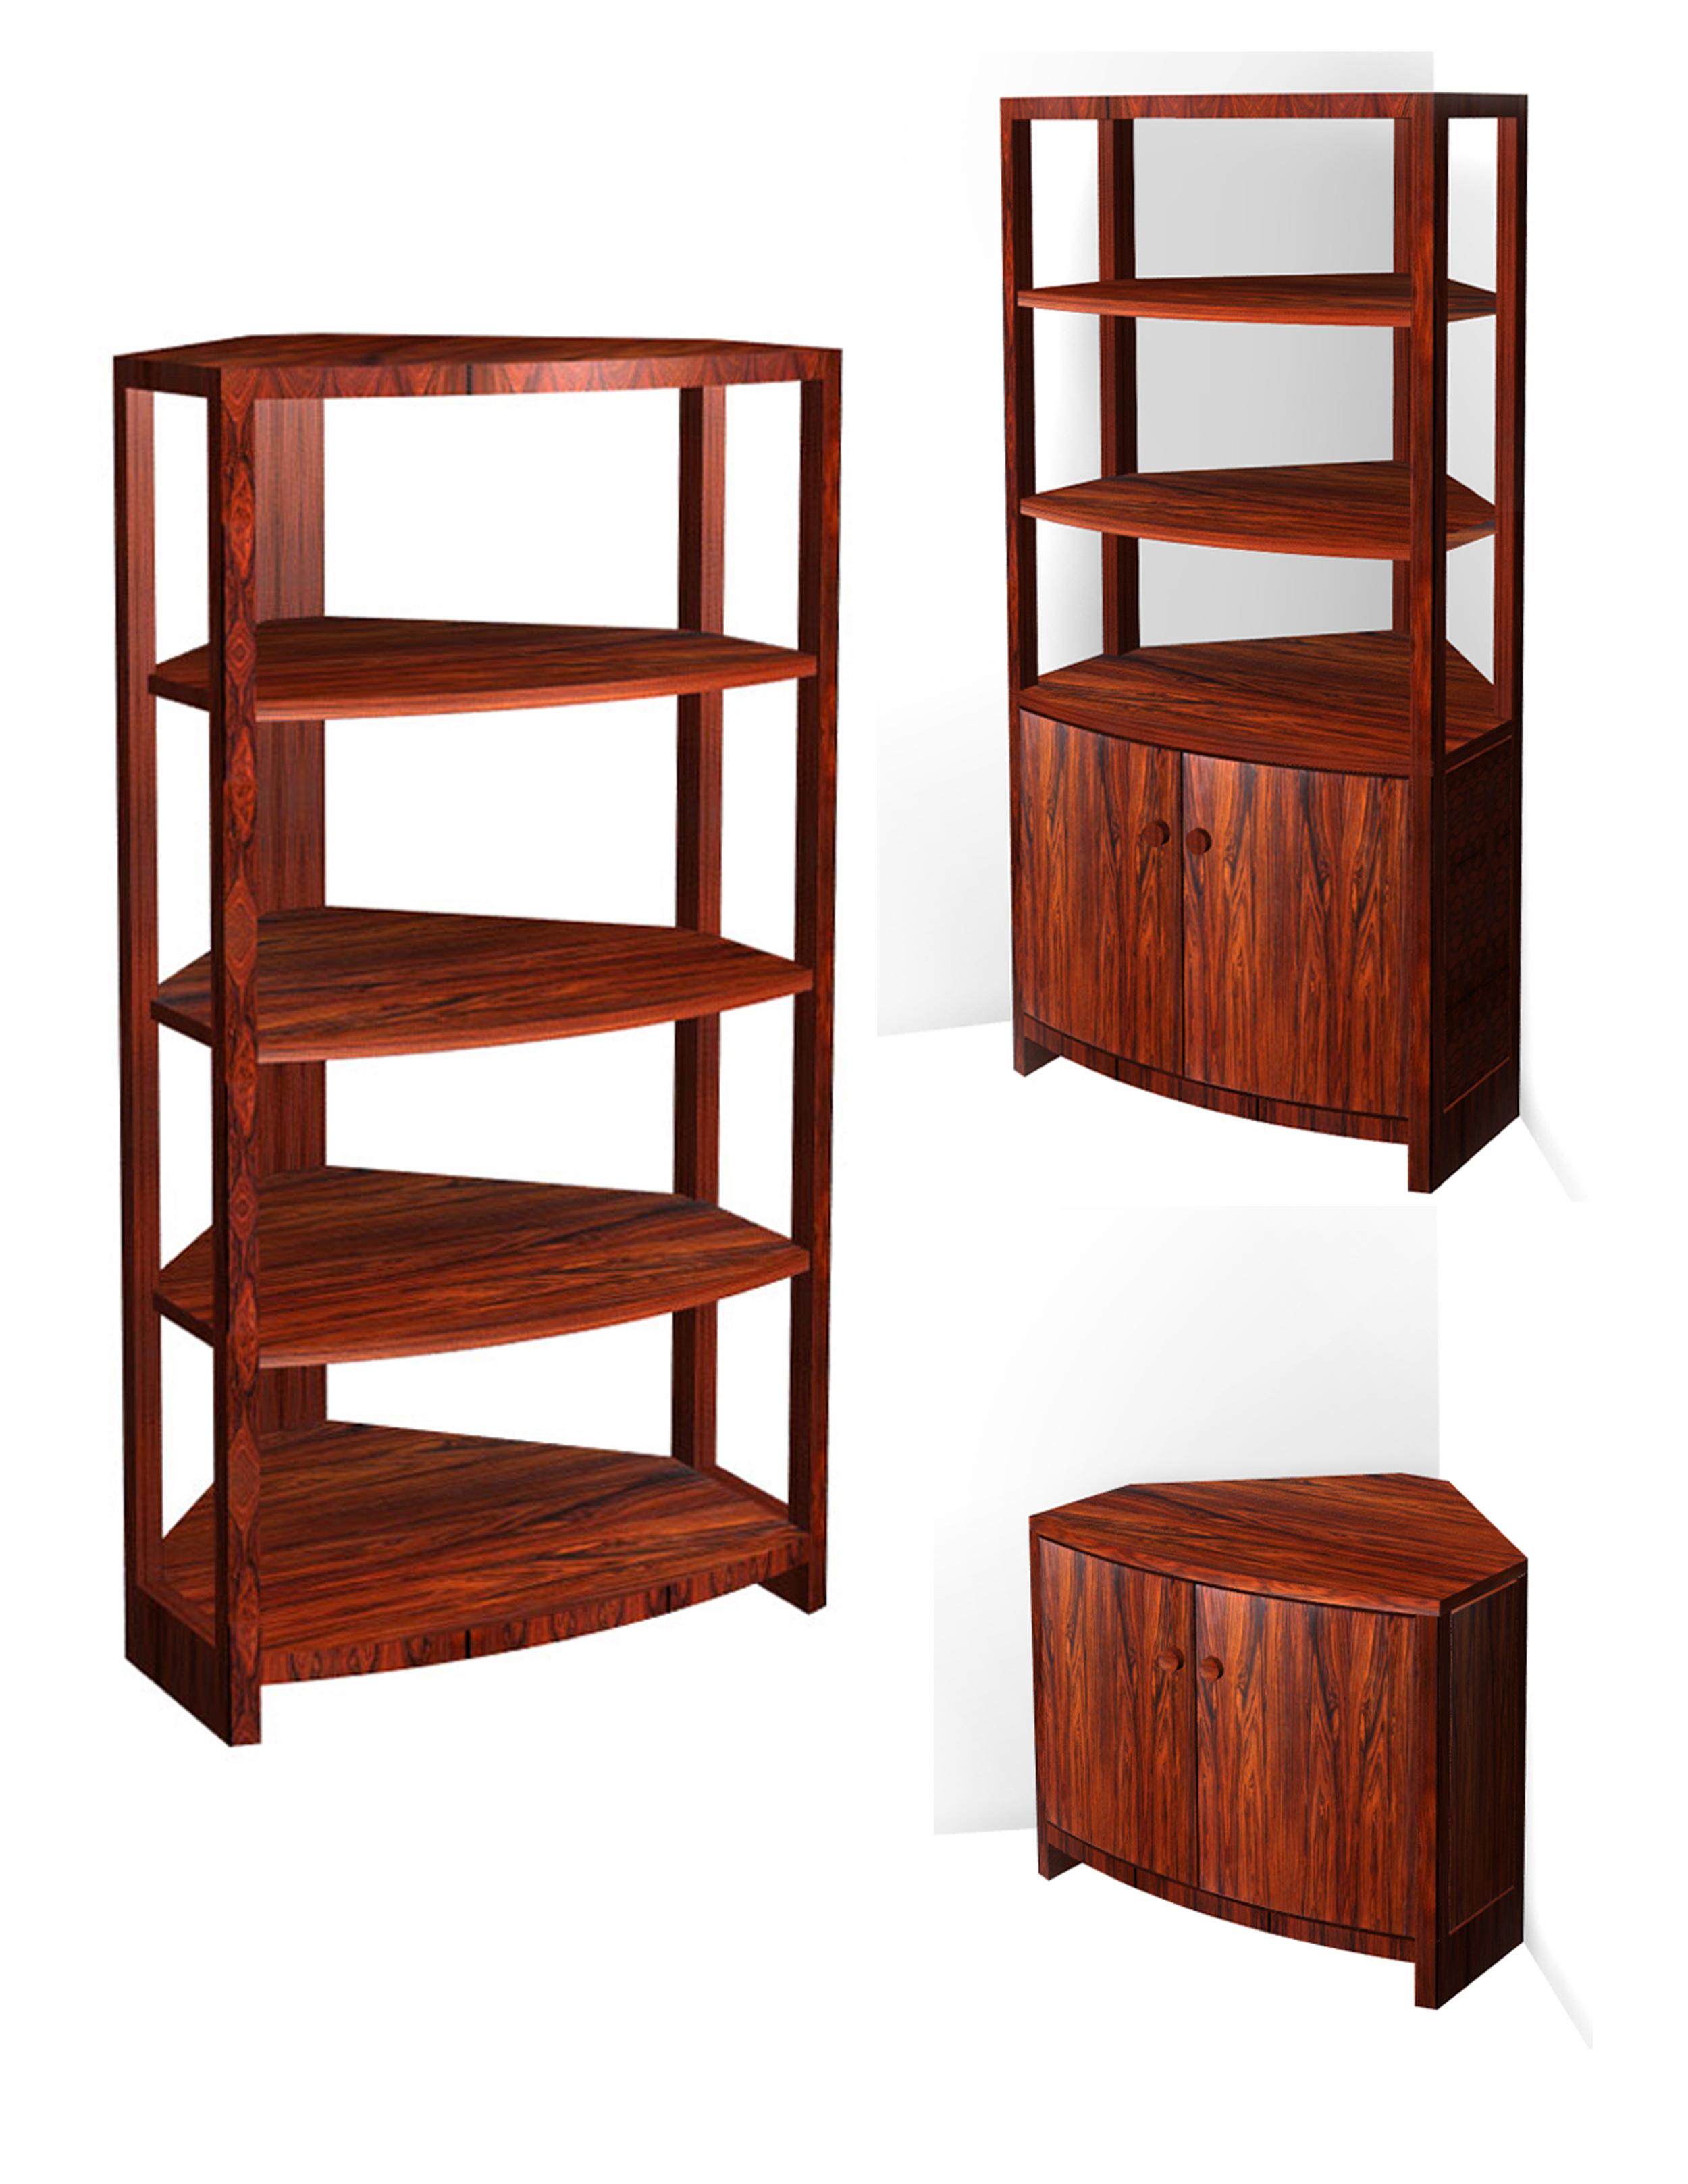 Sj Sallinger Cabinet Designs